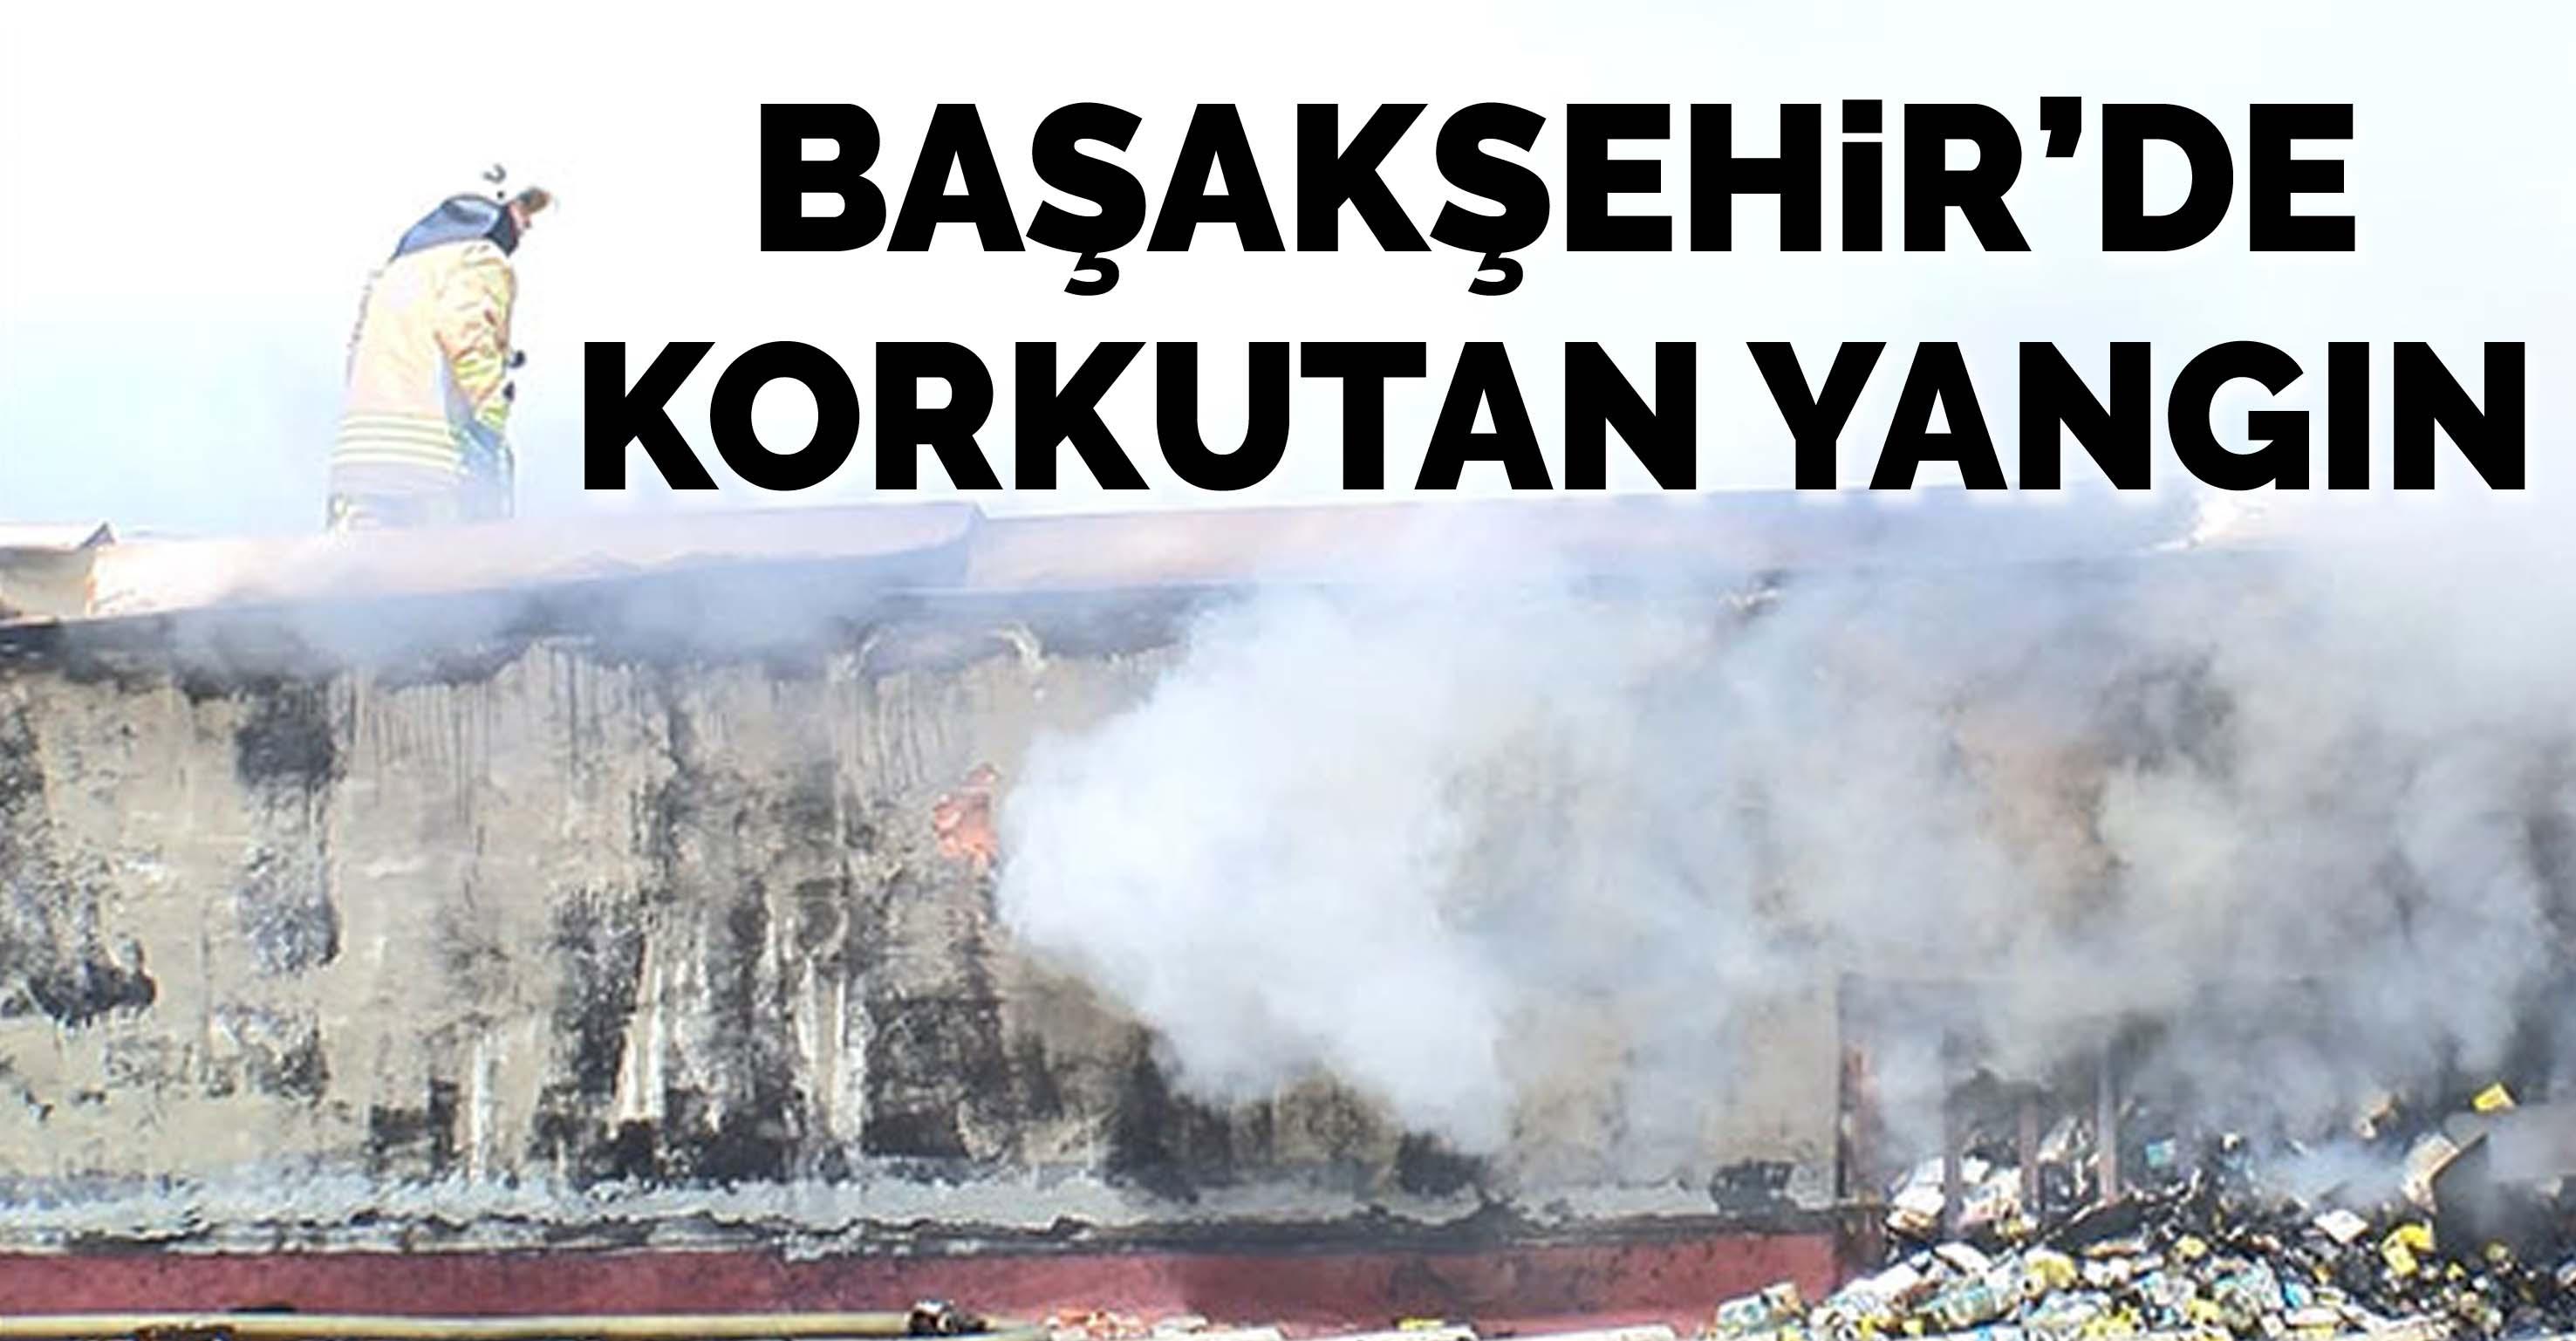 Başakşehir'de iş yerinin çatısı alev alev yandı